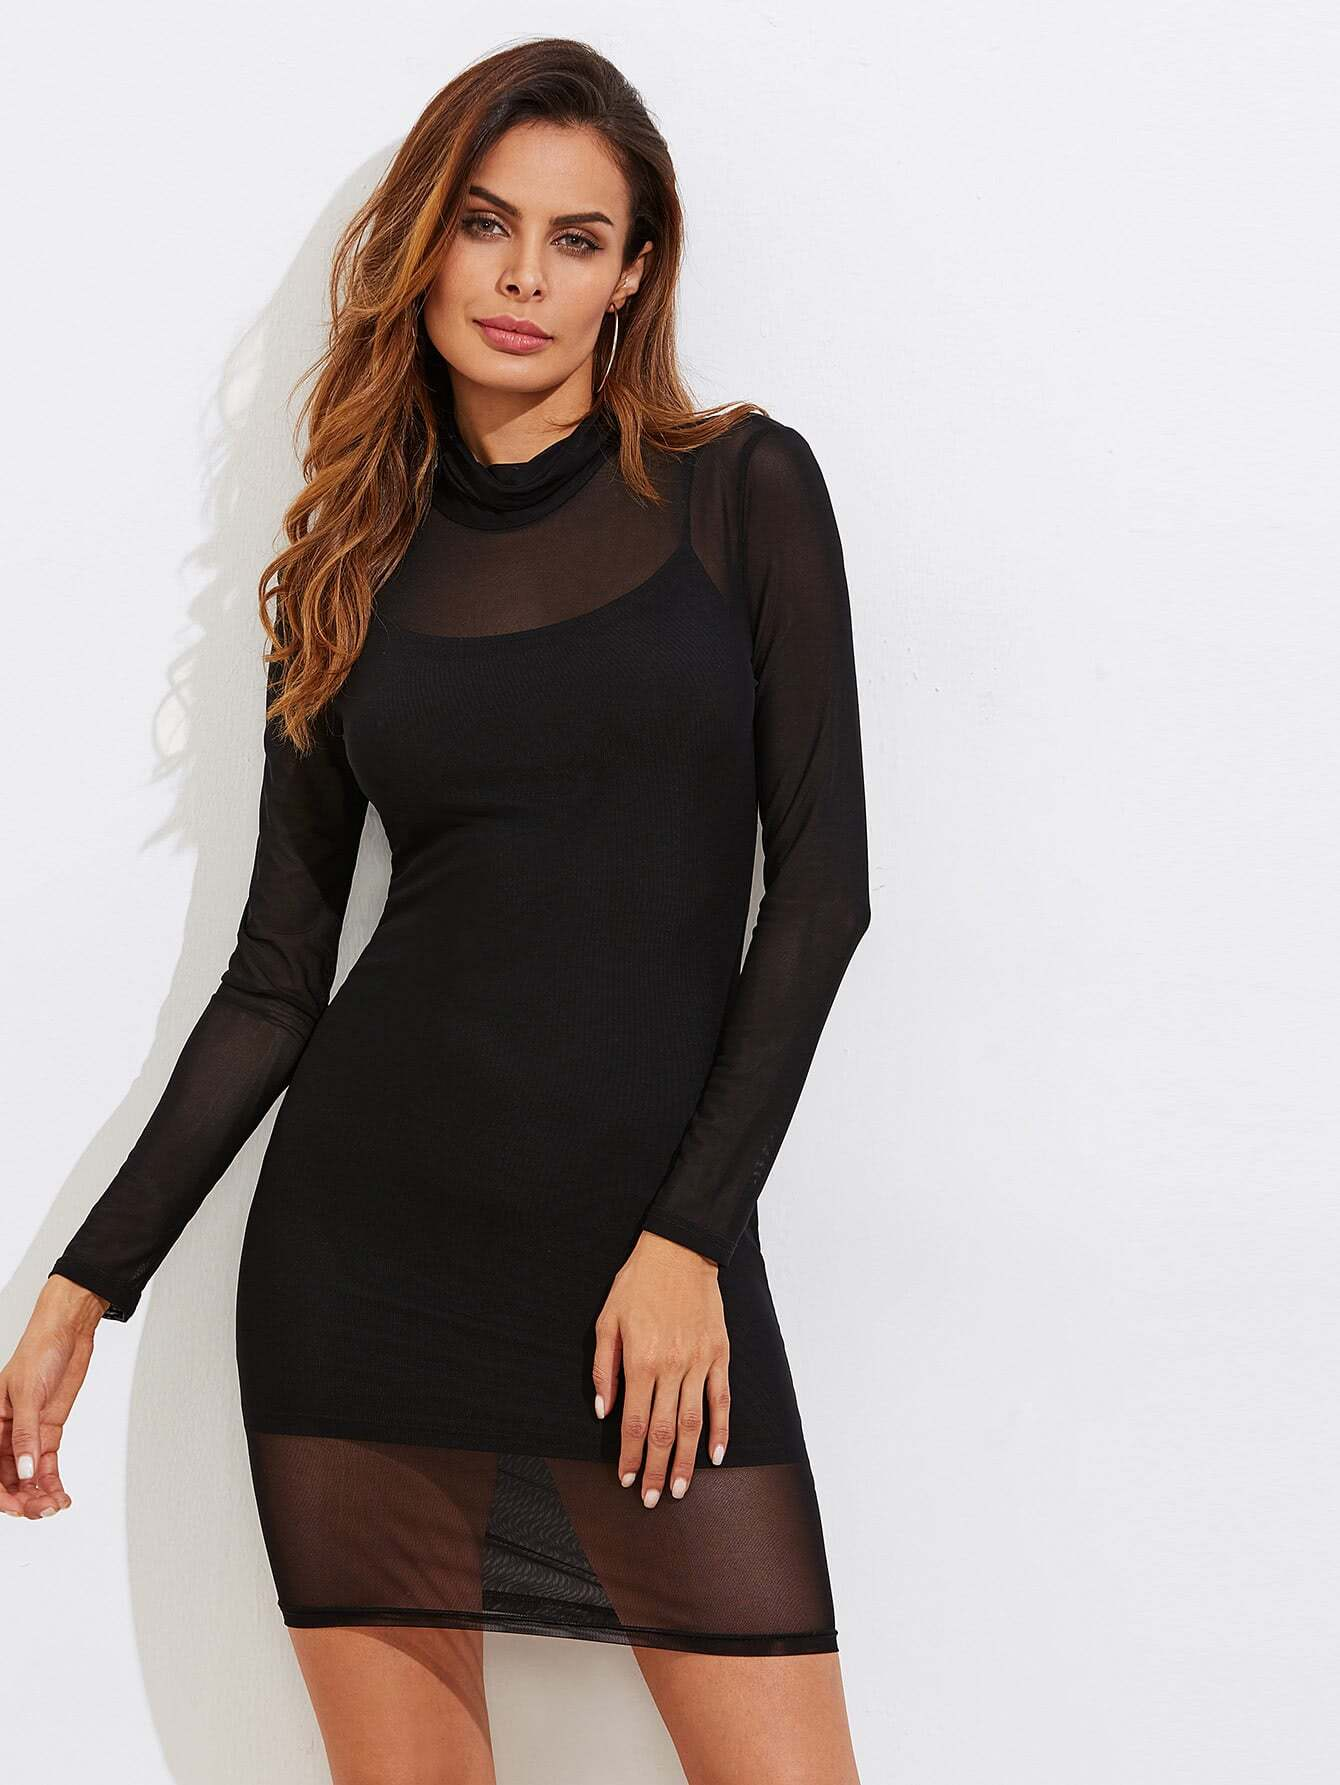 romwe fashions,Sheer Mesh Bodycon Dress With Rib Cami Dress